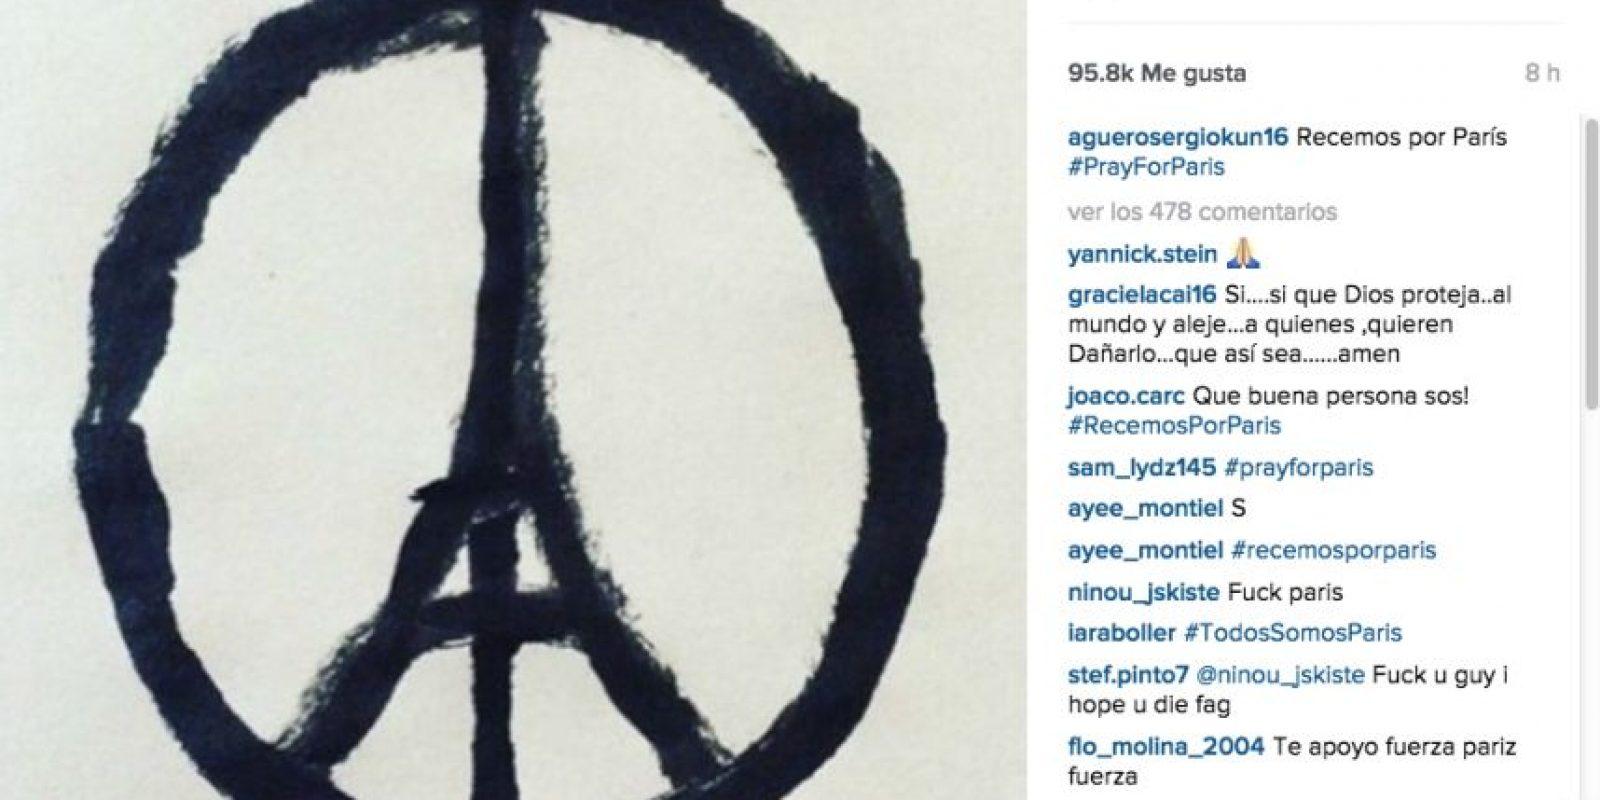 "Sergio ""Kun"" Aguero: Recemos por París. Foto:Vía instagram.com/aguerosergiokun16"